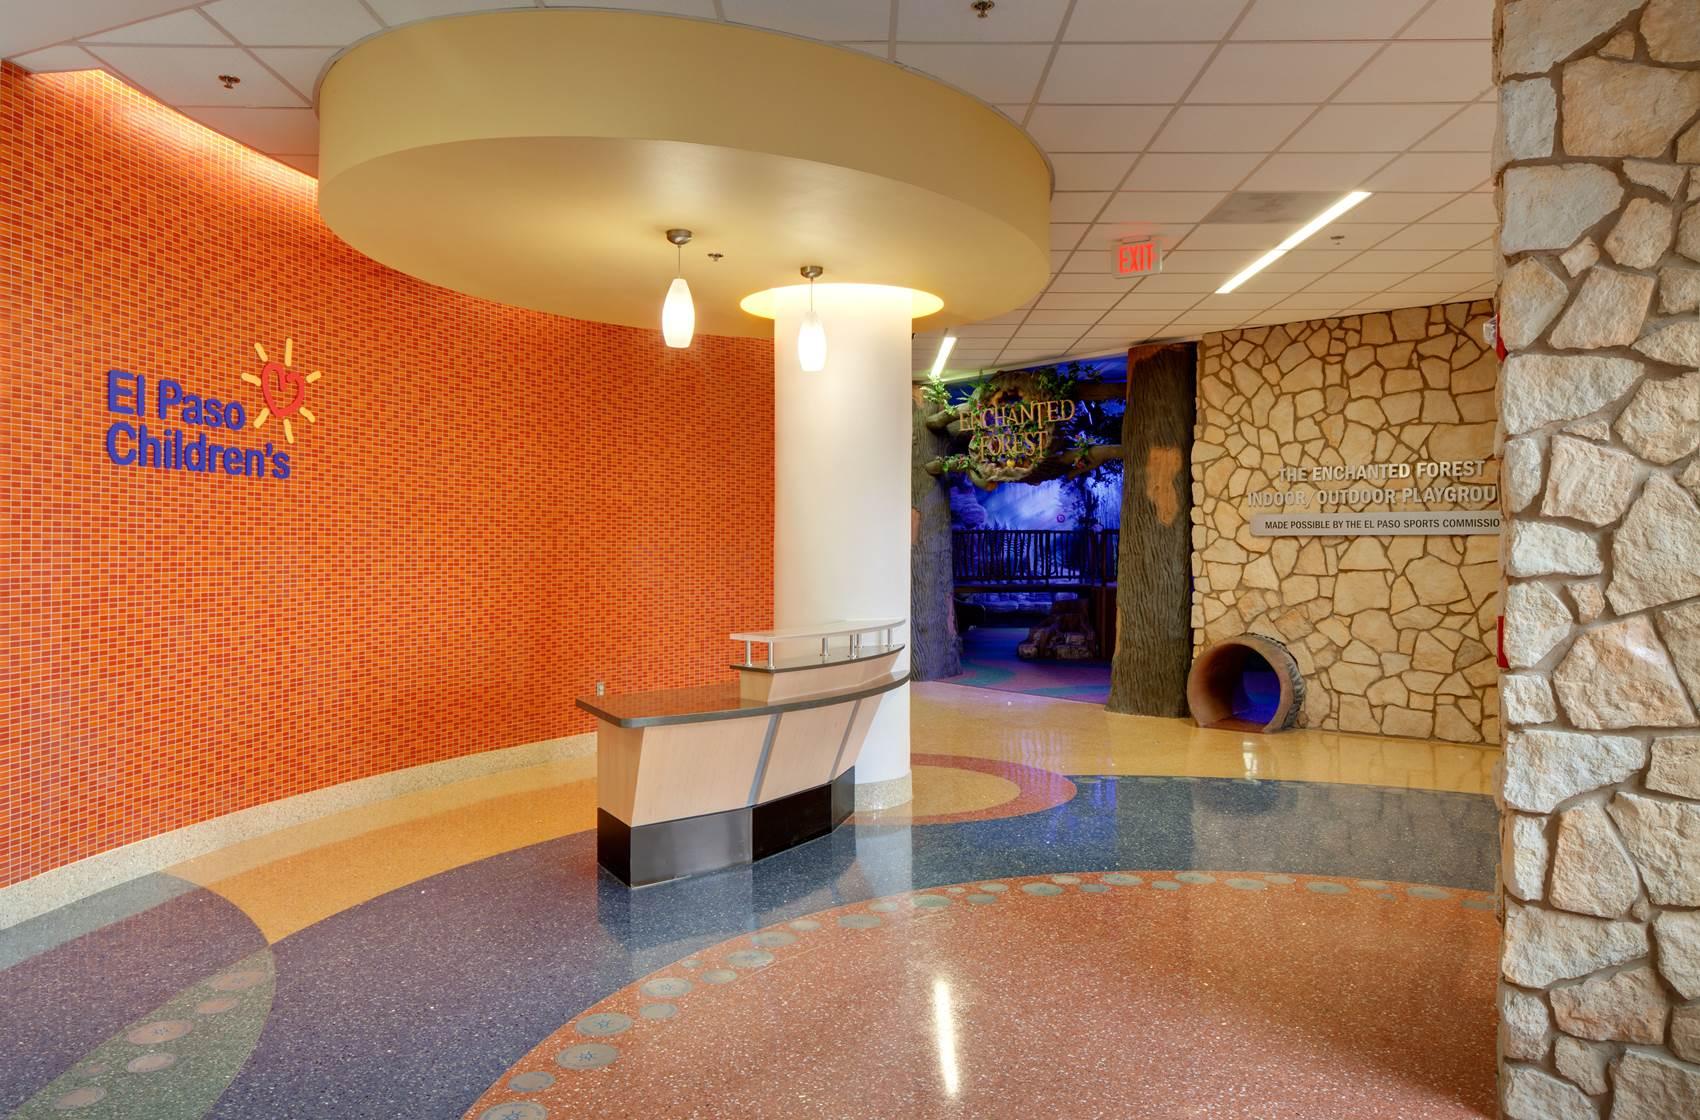 Children's Hospital at the University Medical Center of El Paso